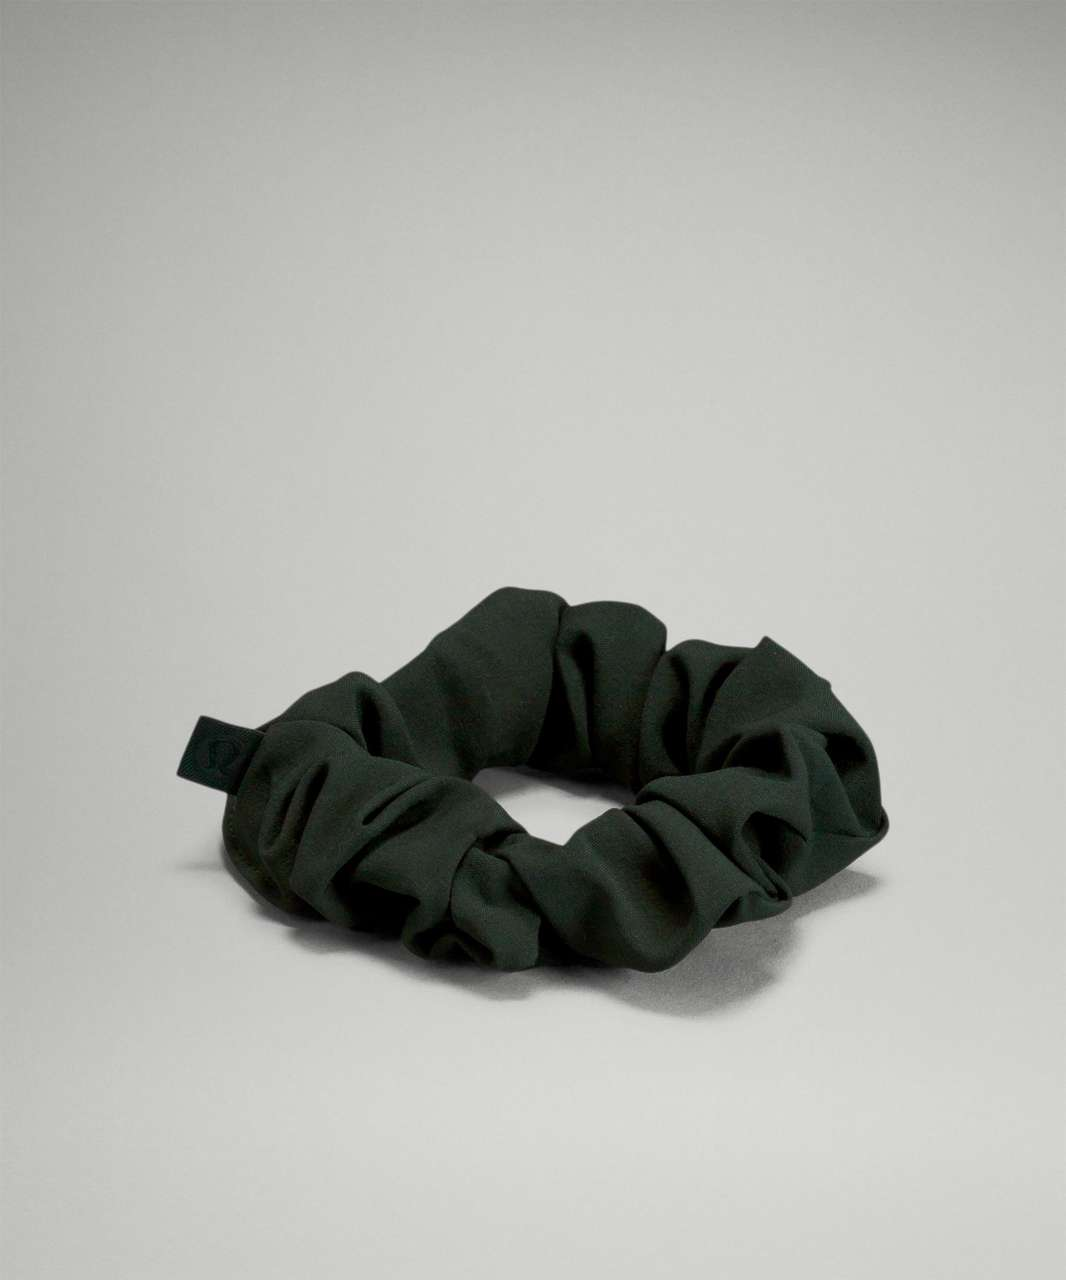 Lululemon Uplifting Scrunchie - Rainforest Green